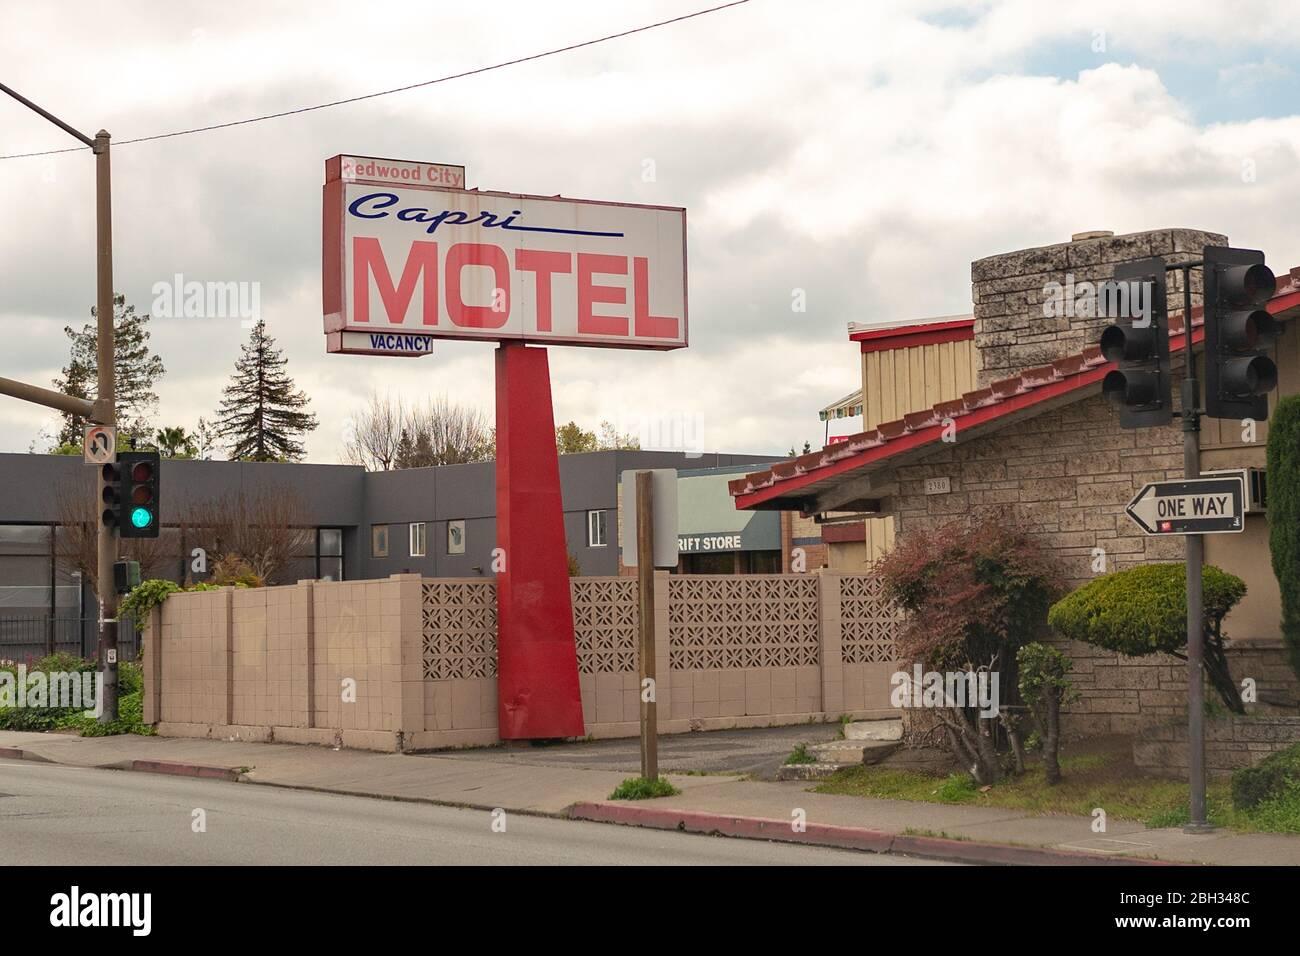 Sign for the Capri Motel in the Silicon Valley, Foster City, California, April 10, 2020. () Stock Photo